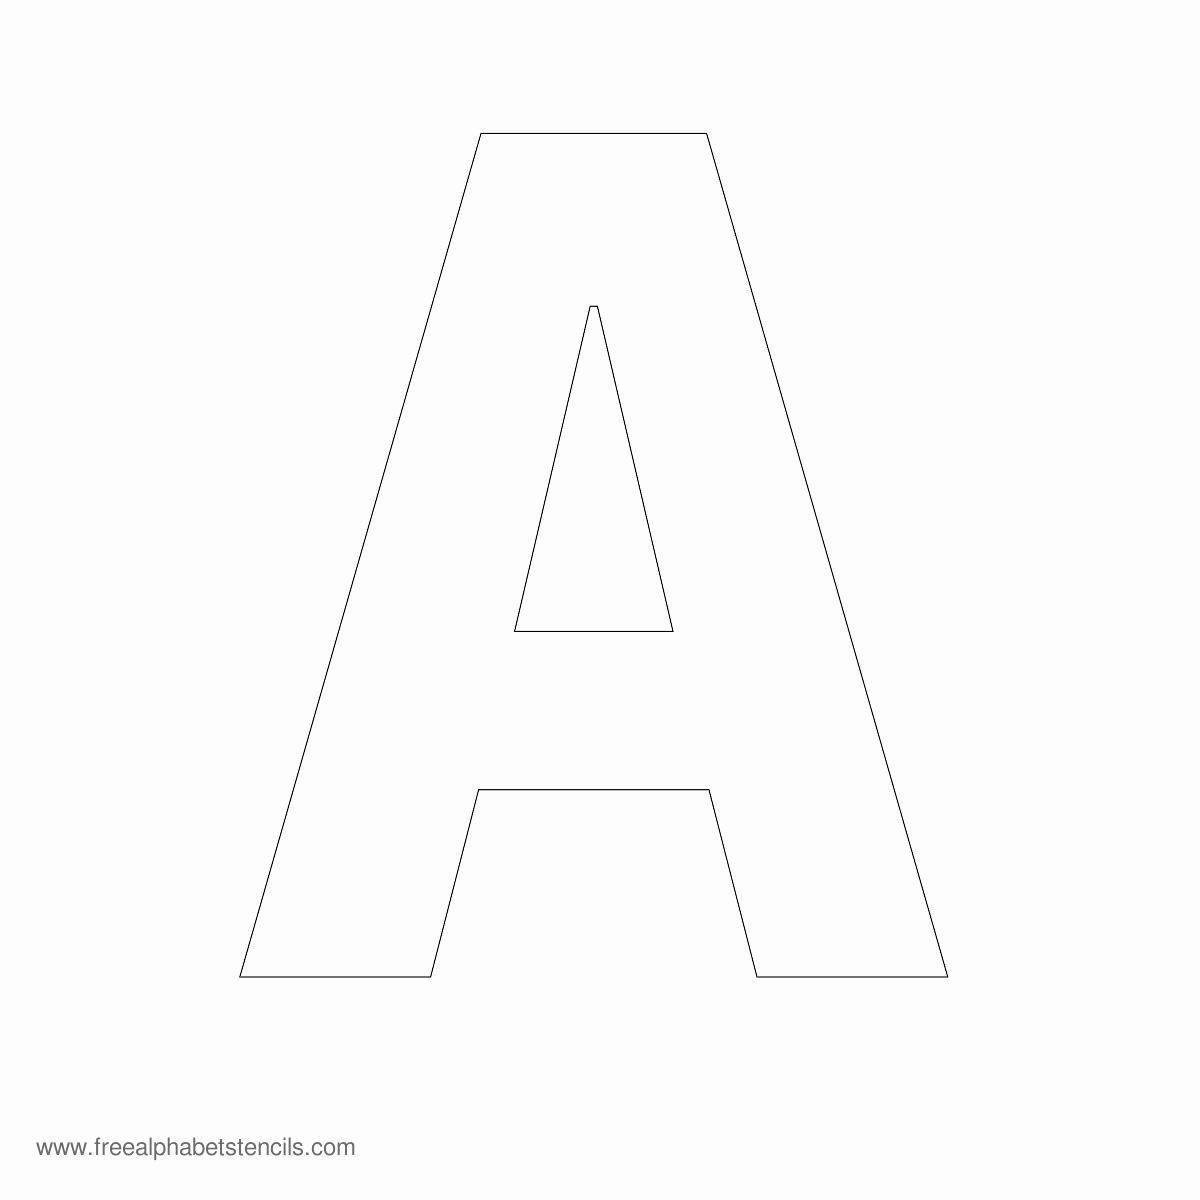 Lettering Stencils to Print Lovely Alphabet Stencils